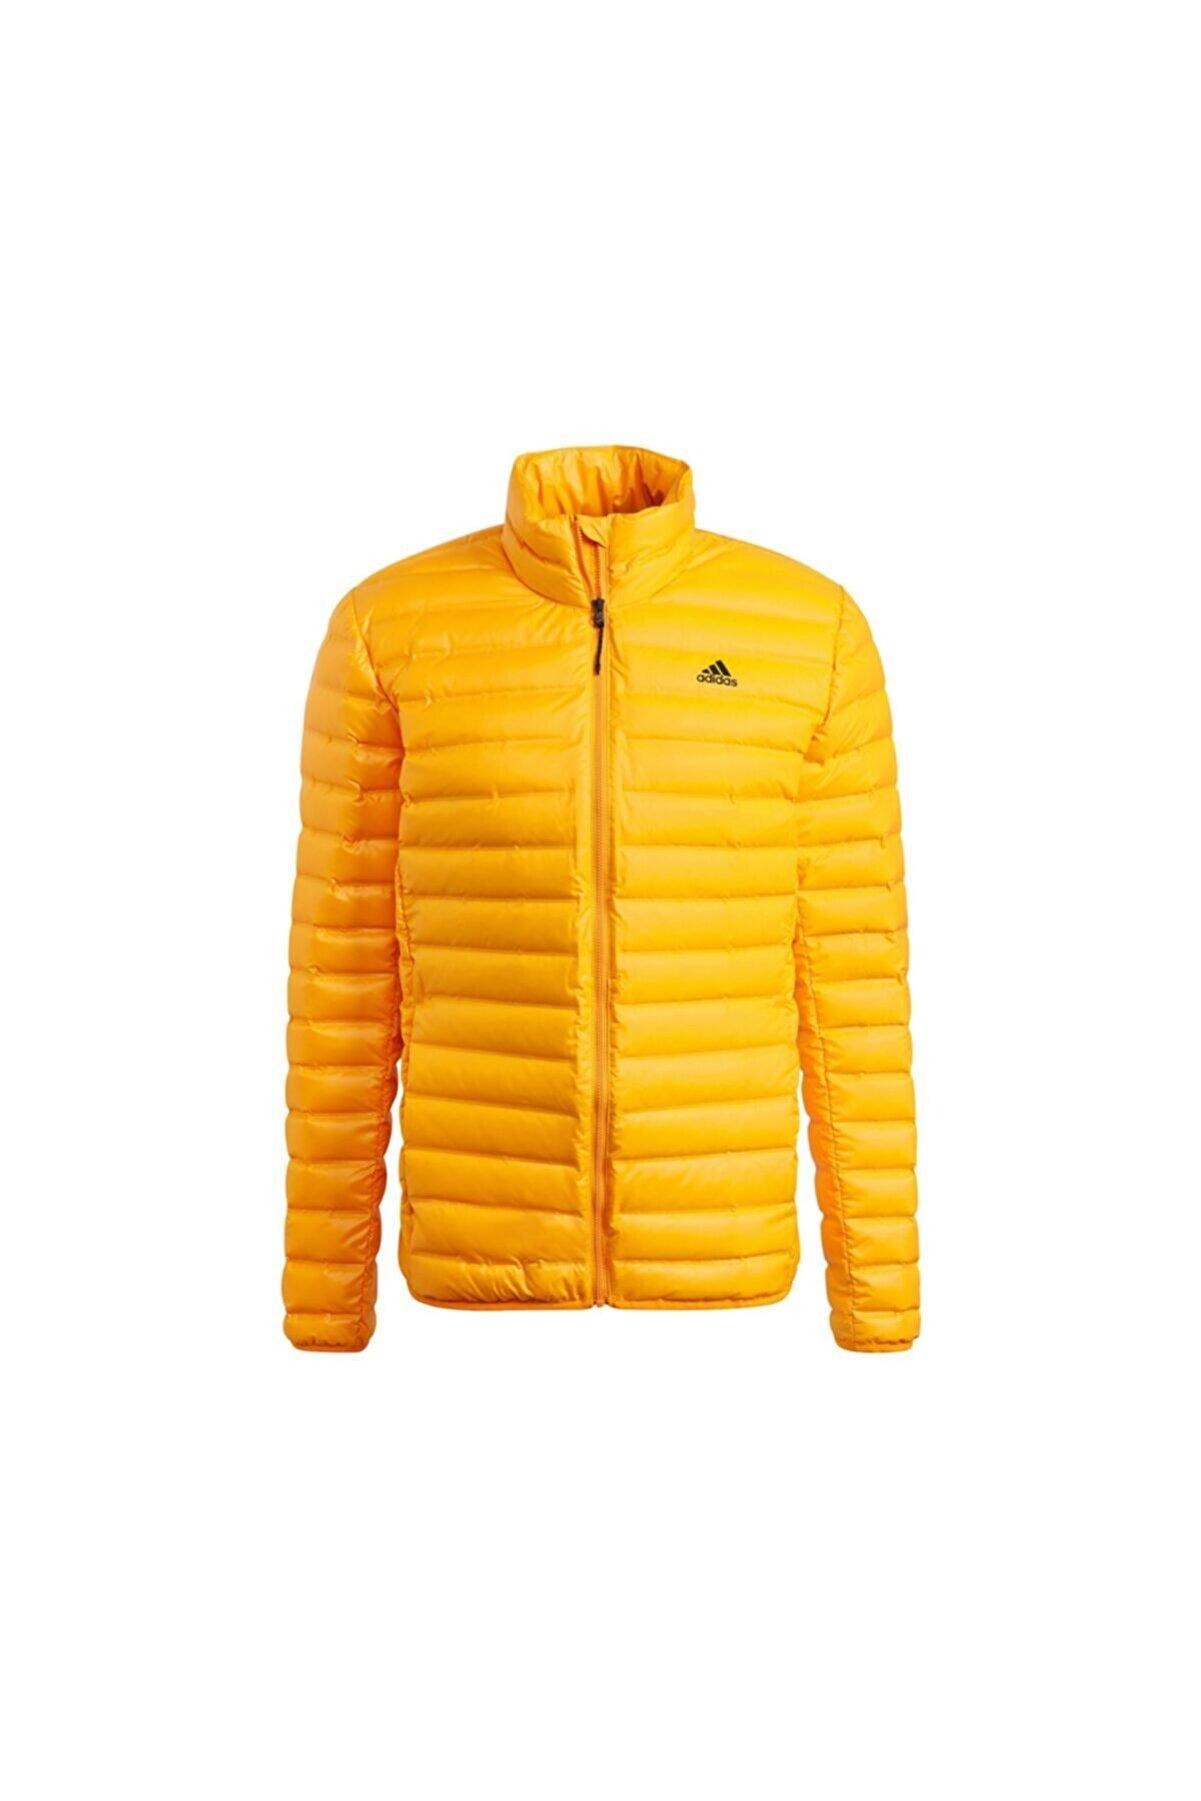 adidas Varilite Jacket Erkek Outdoor Montu Gt9219 Sarı